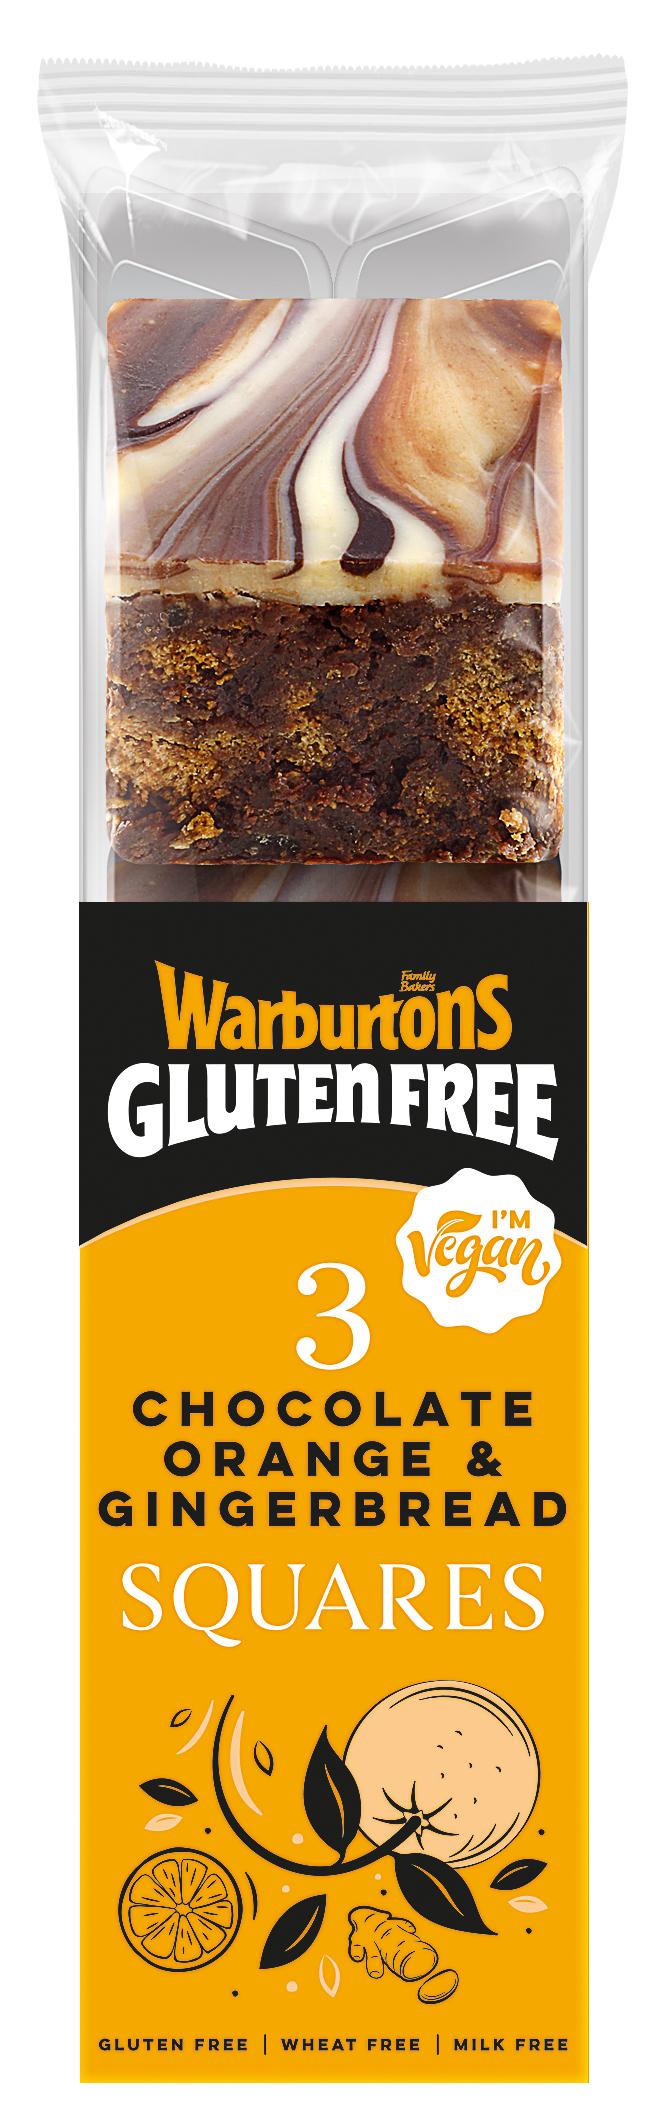 Warburtons Gluten Free Chocolate Orange and Gingerbread Squares